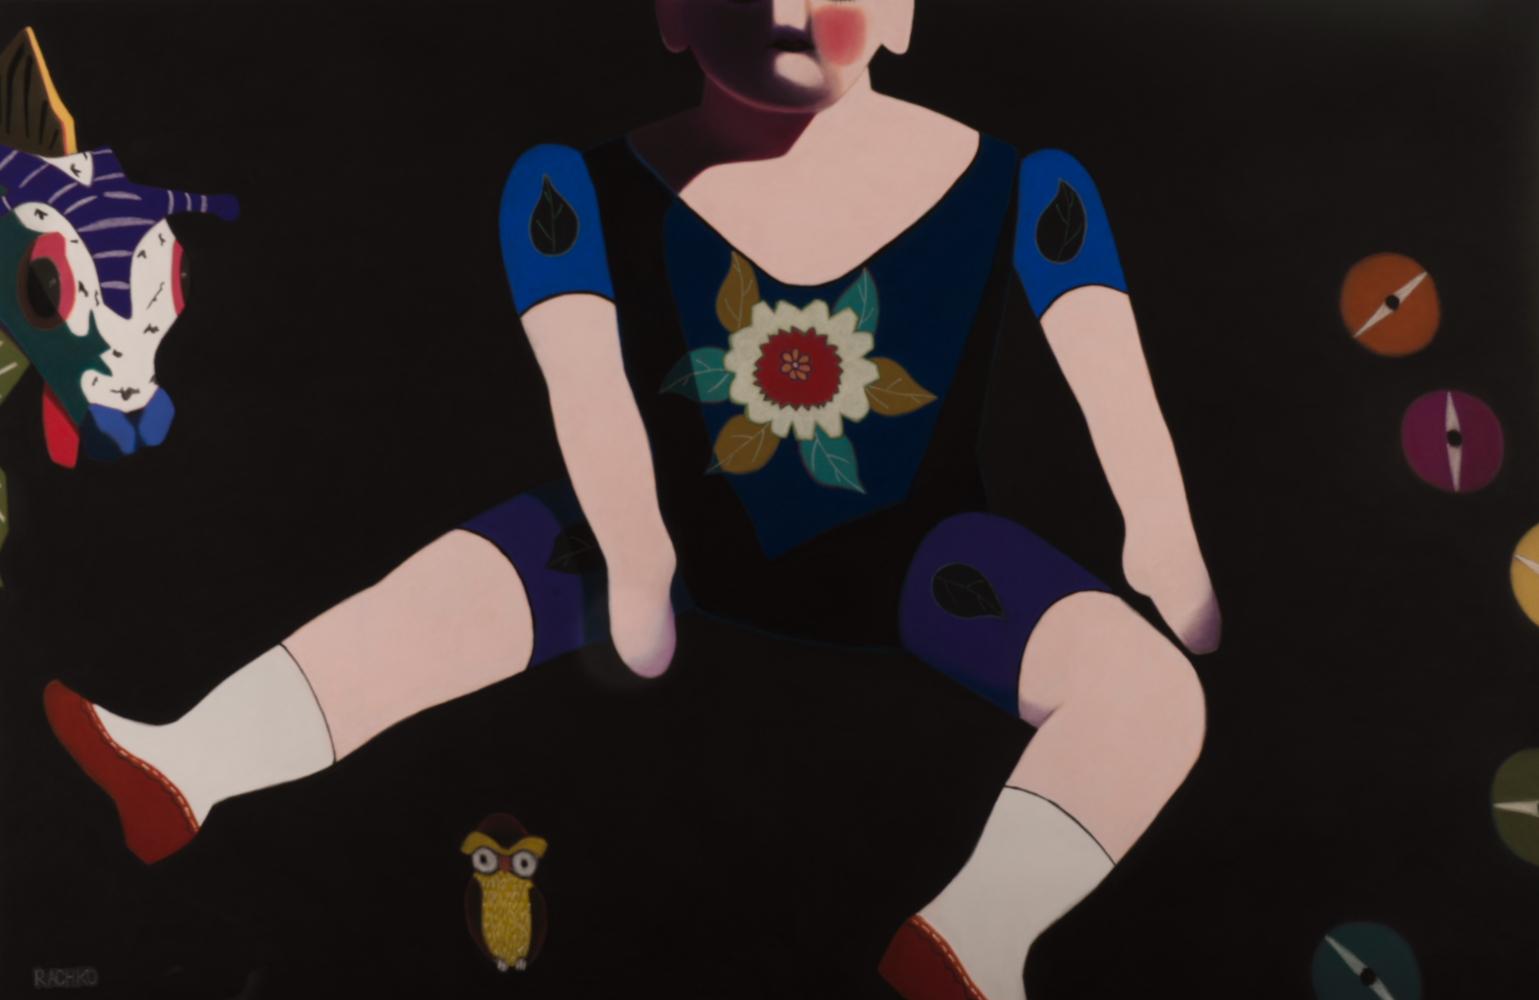 """Incognito""  Soft Pastel on Sandpaper 38"" x 58"" image 50"" x 70"" framed 2014"